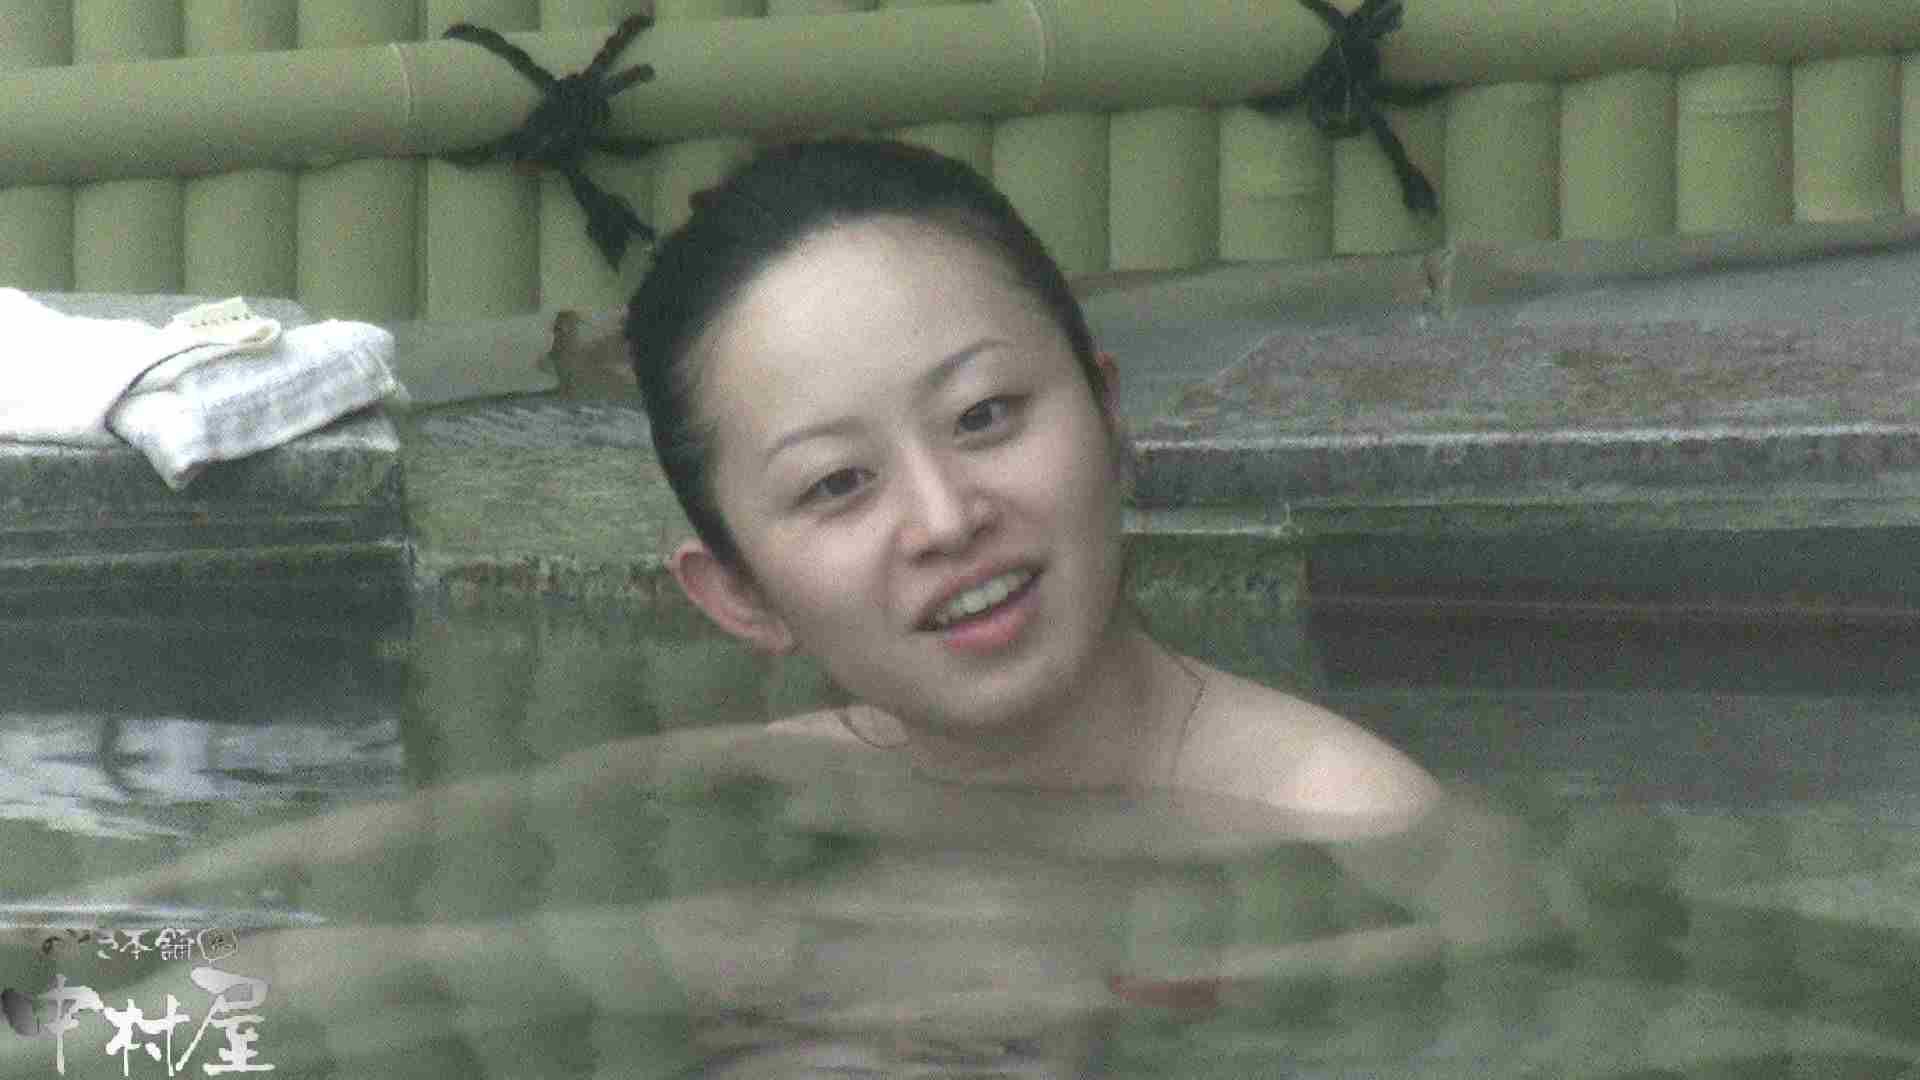 Aquaな露天風呂Vol.912 OLセックス   盗撮  62画像 40